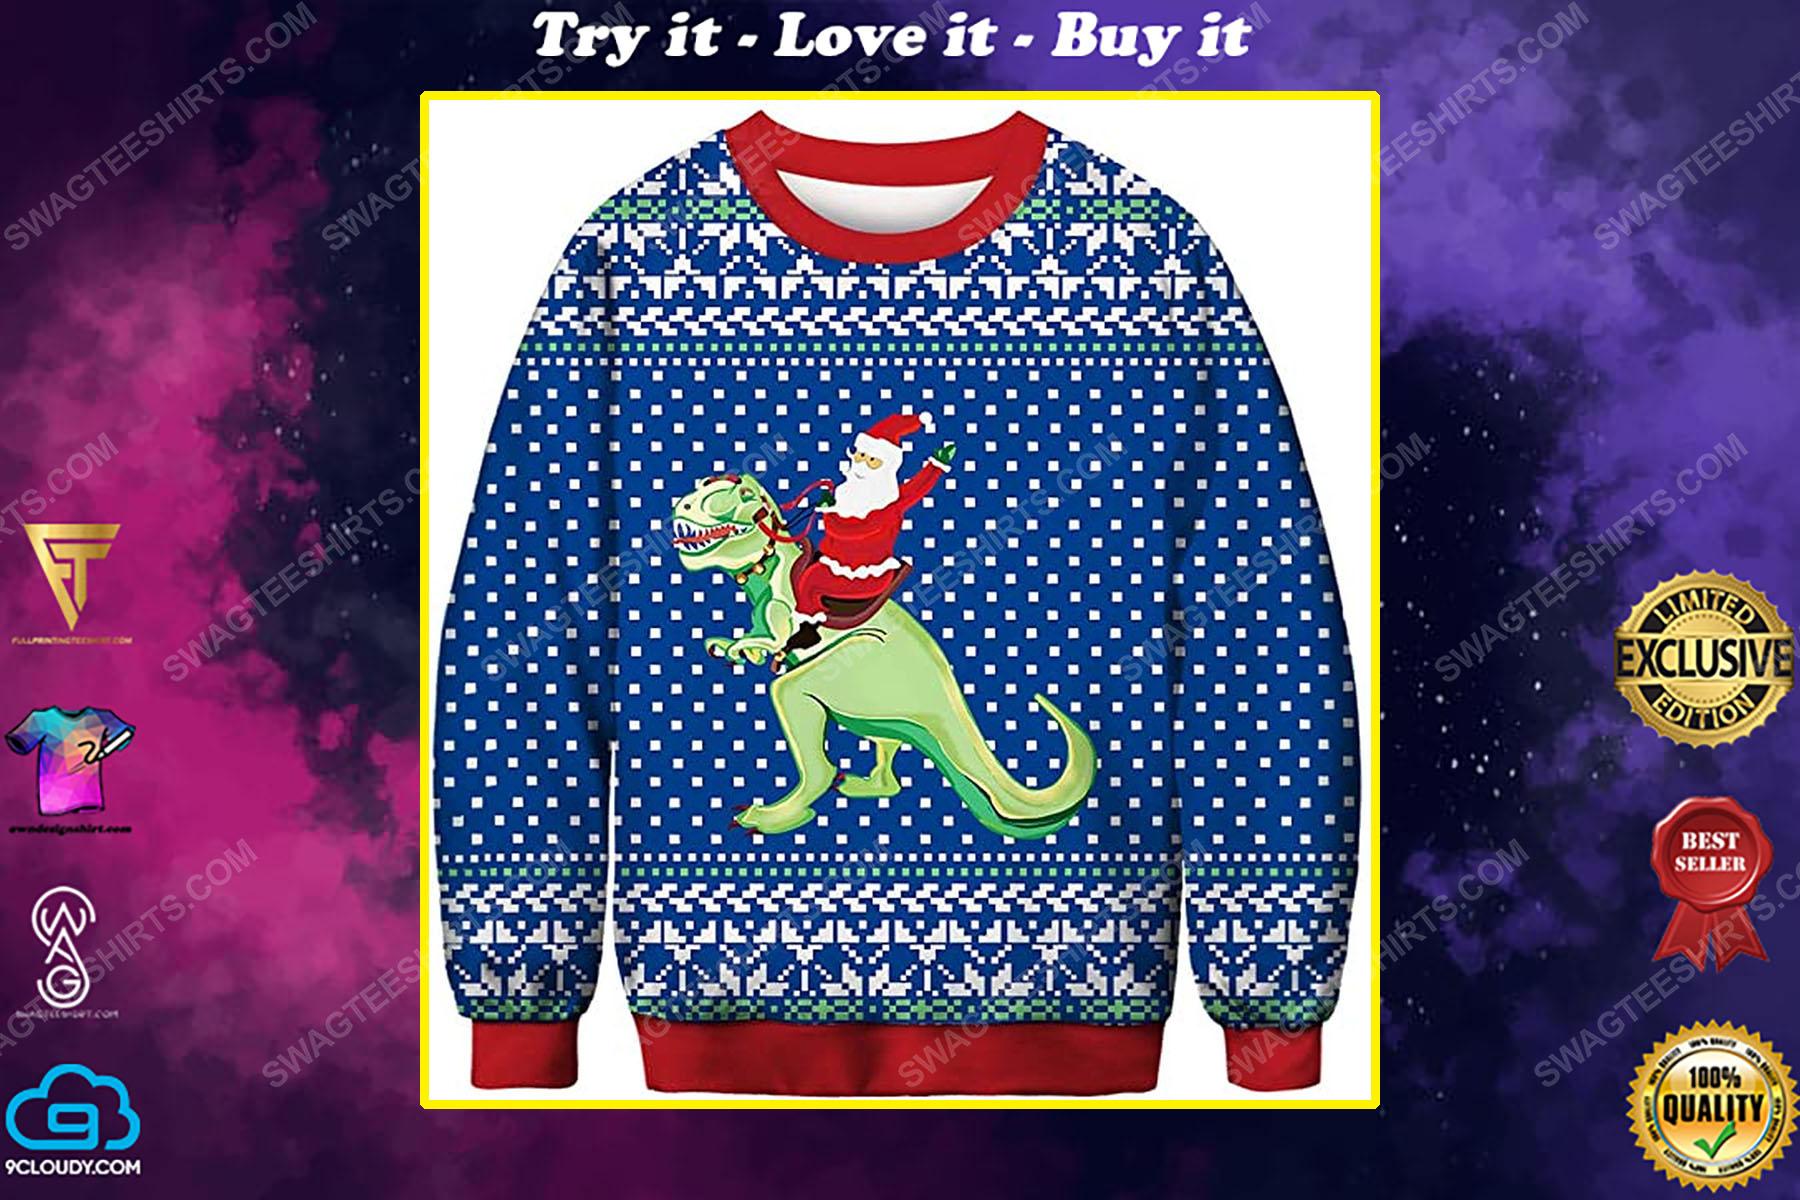 Santa claus riding a dinosaur full print ugly christmas sweater